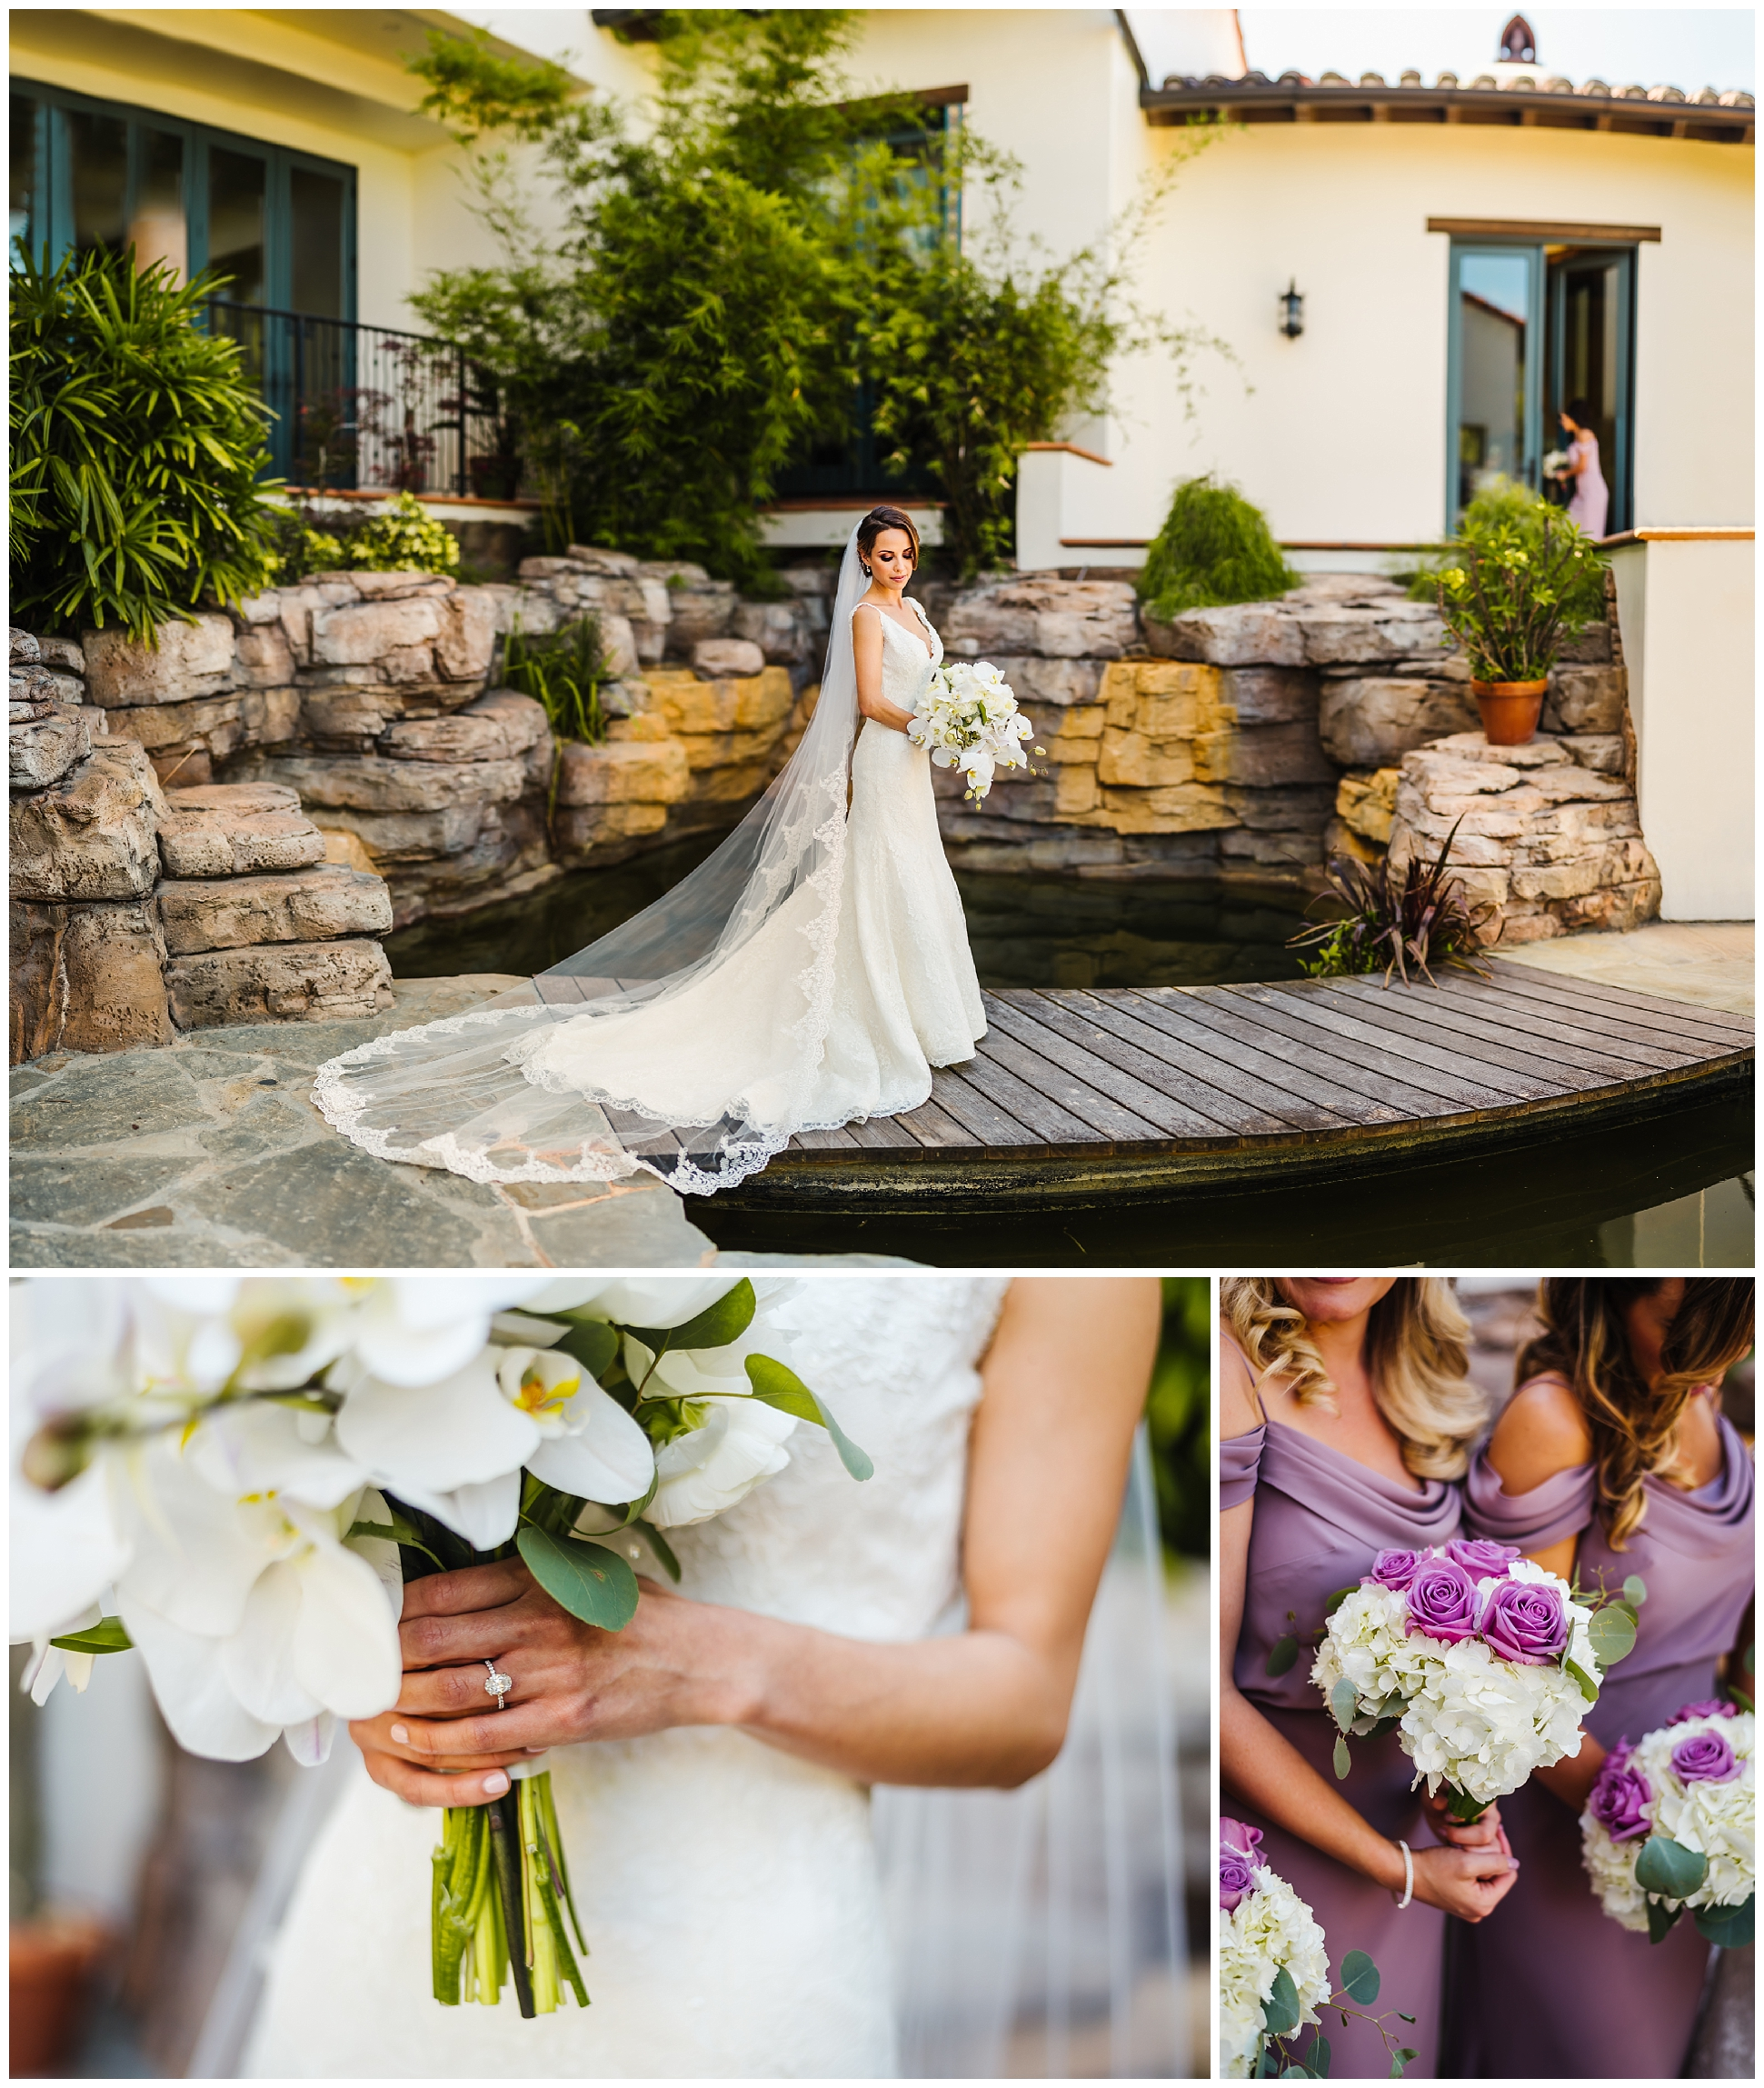 Tampa-luxury-wedding-photographer-mision-lago-private-estate_0014.jpg